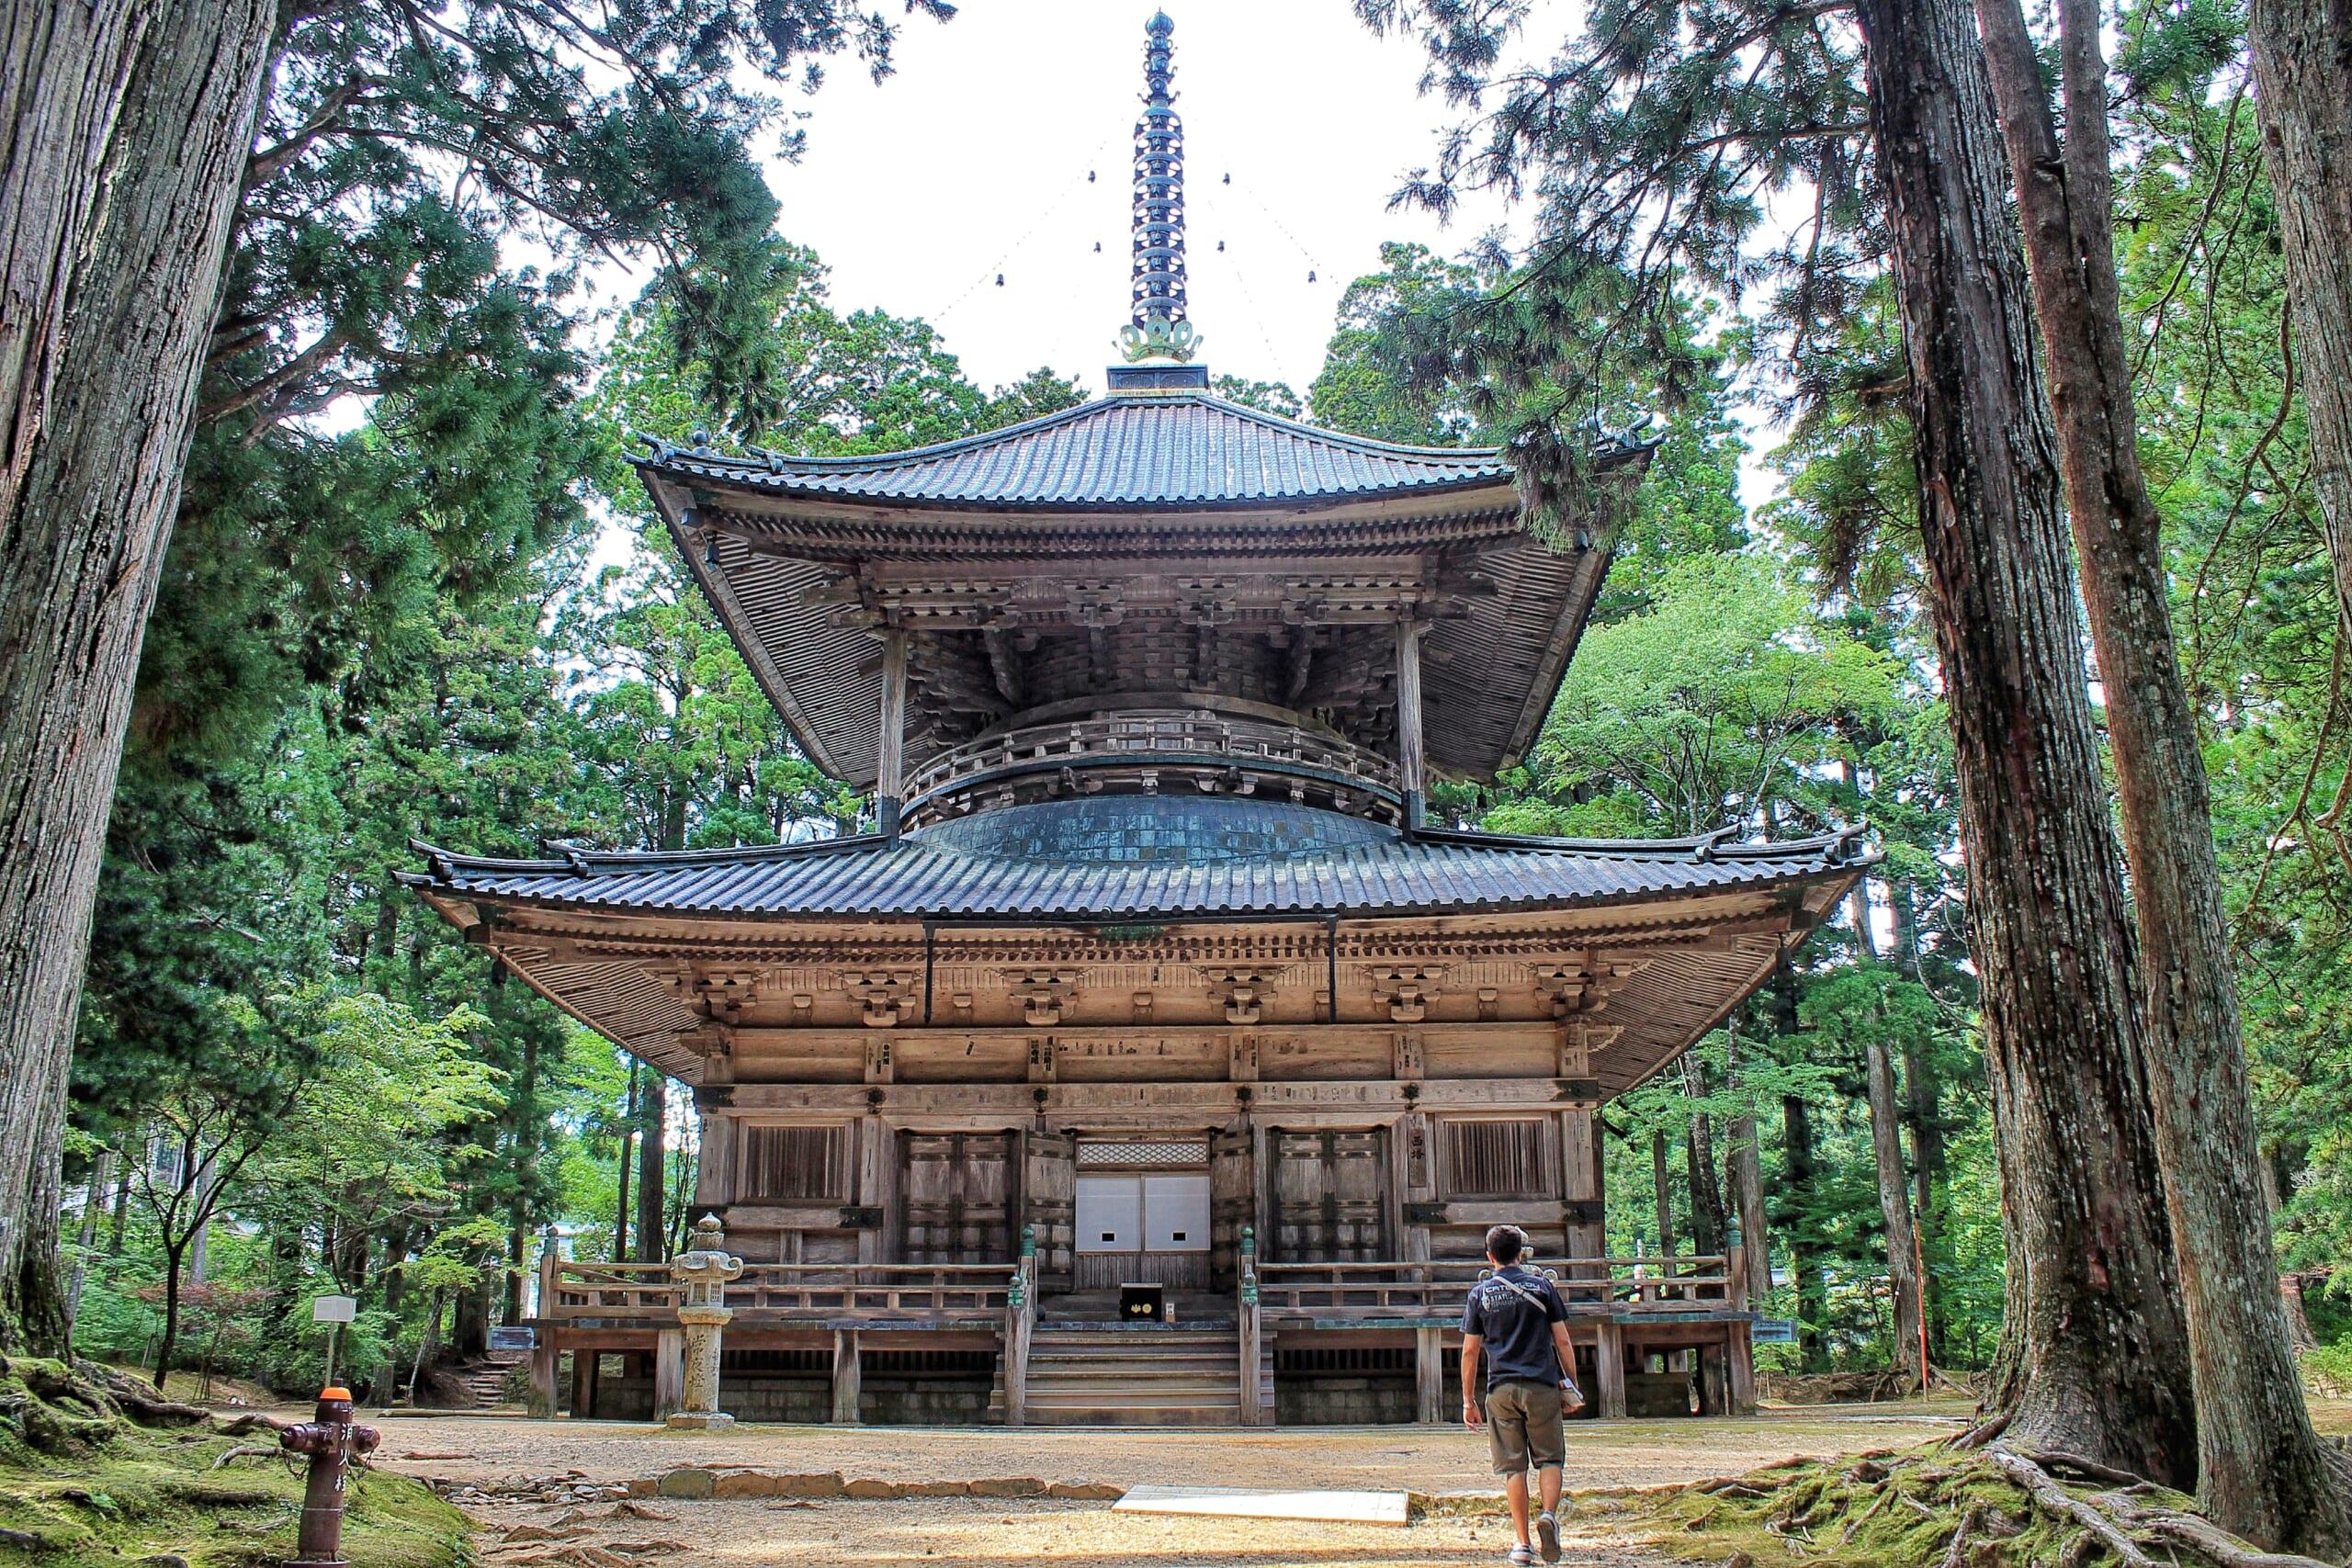 Viaggio al Koyasan: una Notte in un Tempio Giapponese